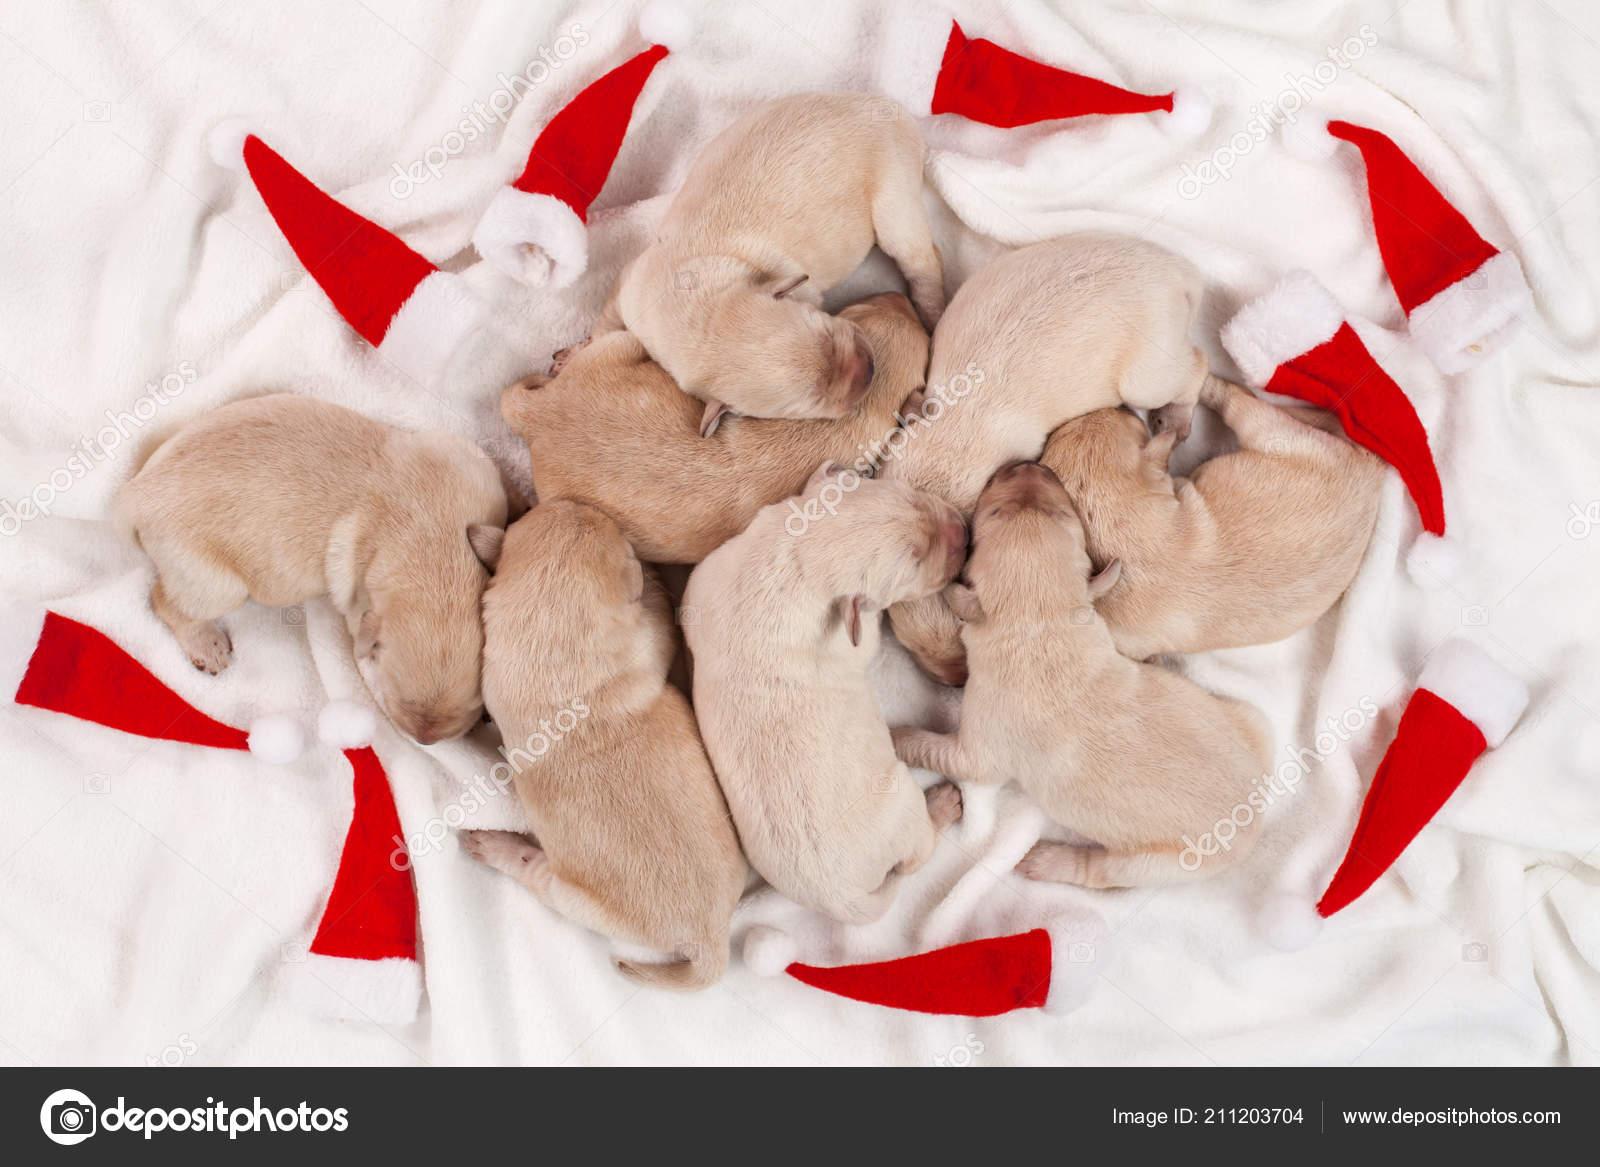 Christmas Party Dropouts Cute Newborn Labrador Puppies Sleeping Small Xmas Stock Photo C Ilona75 211203704